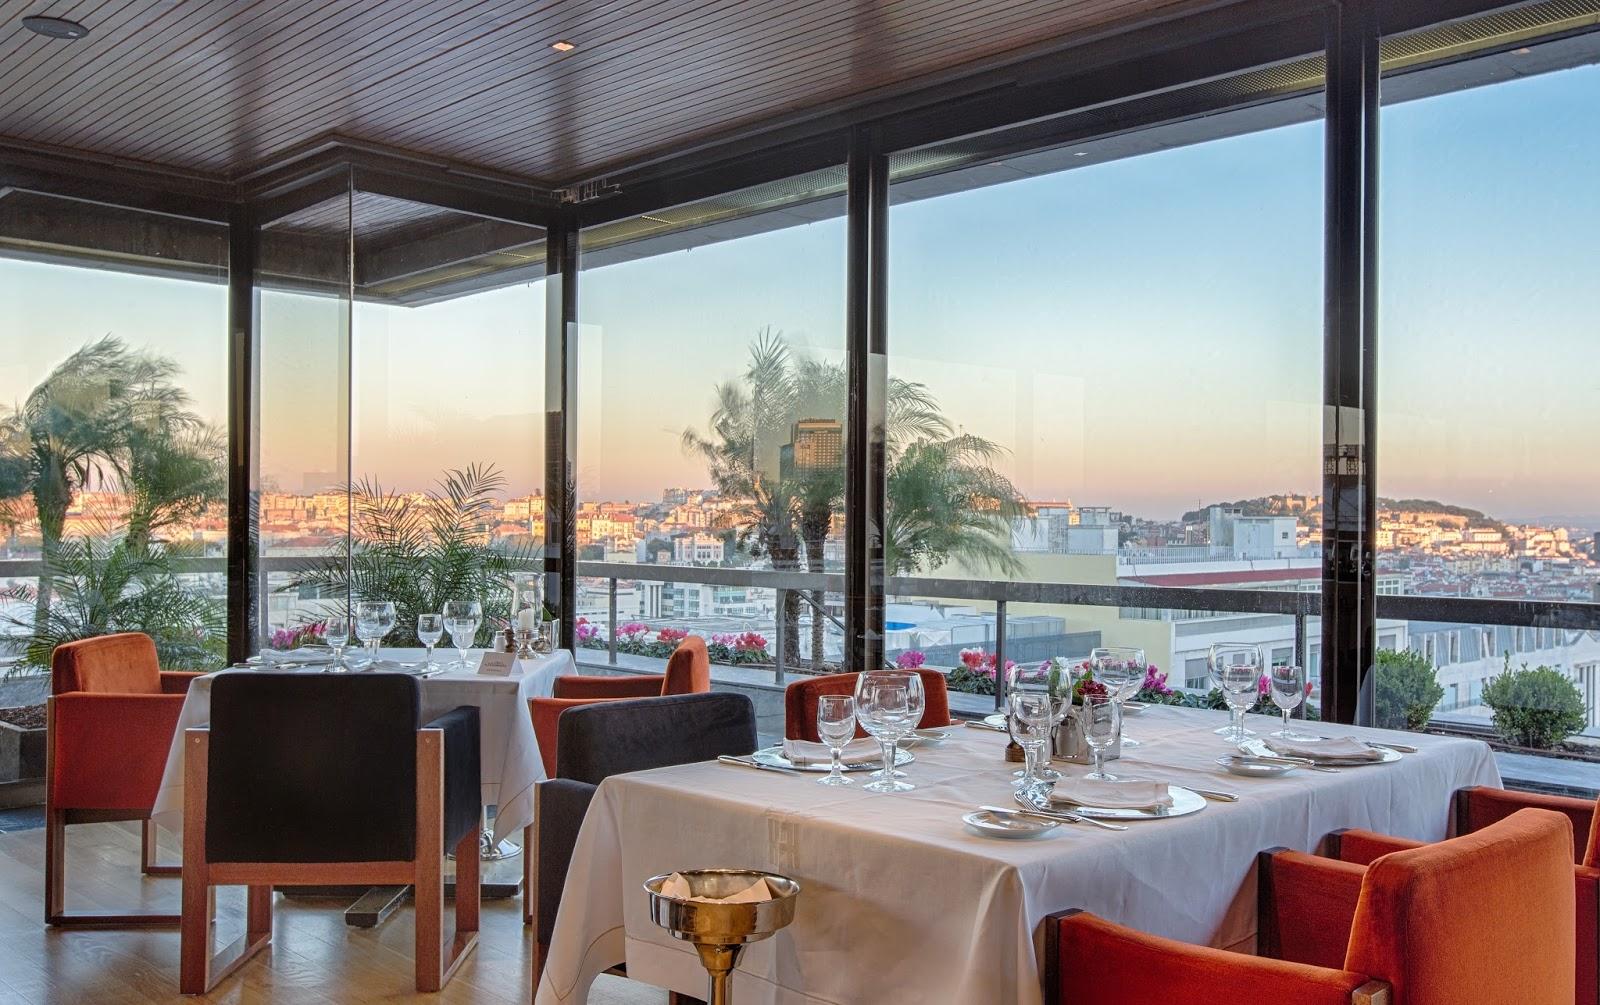 Altis Grand Hotel Lisbonne Tripadvisor